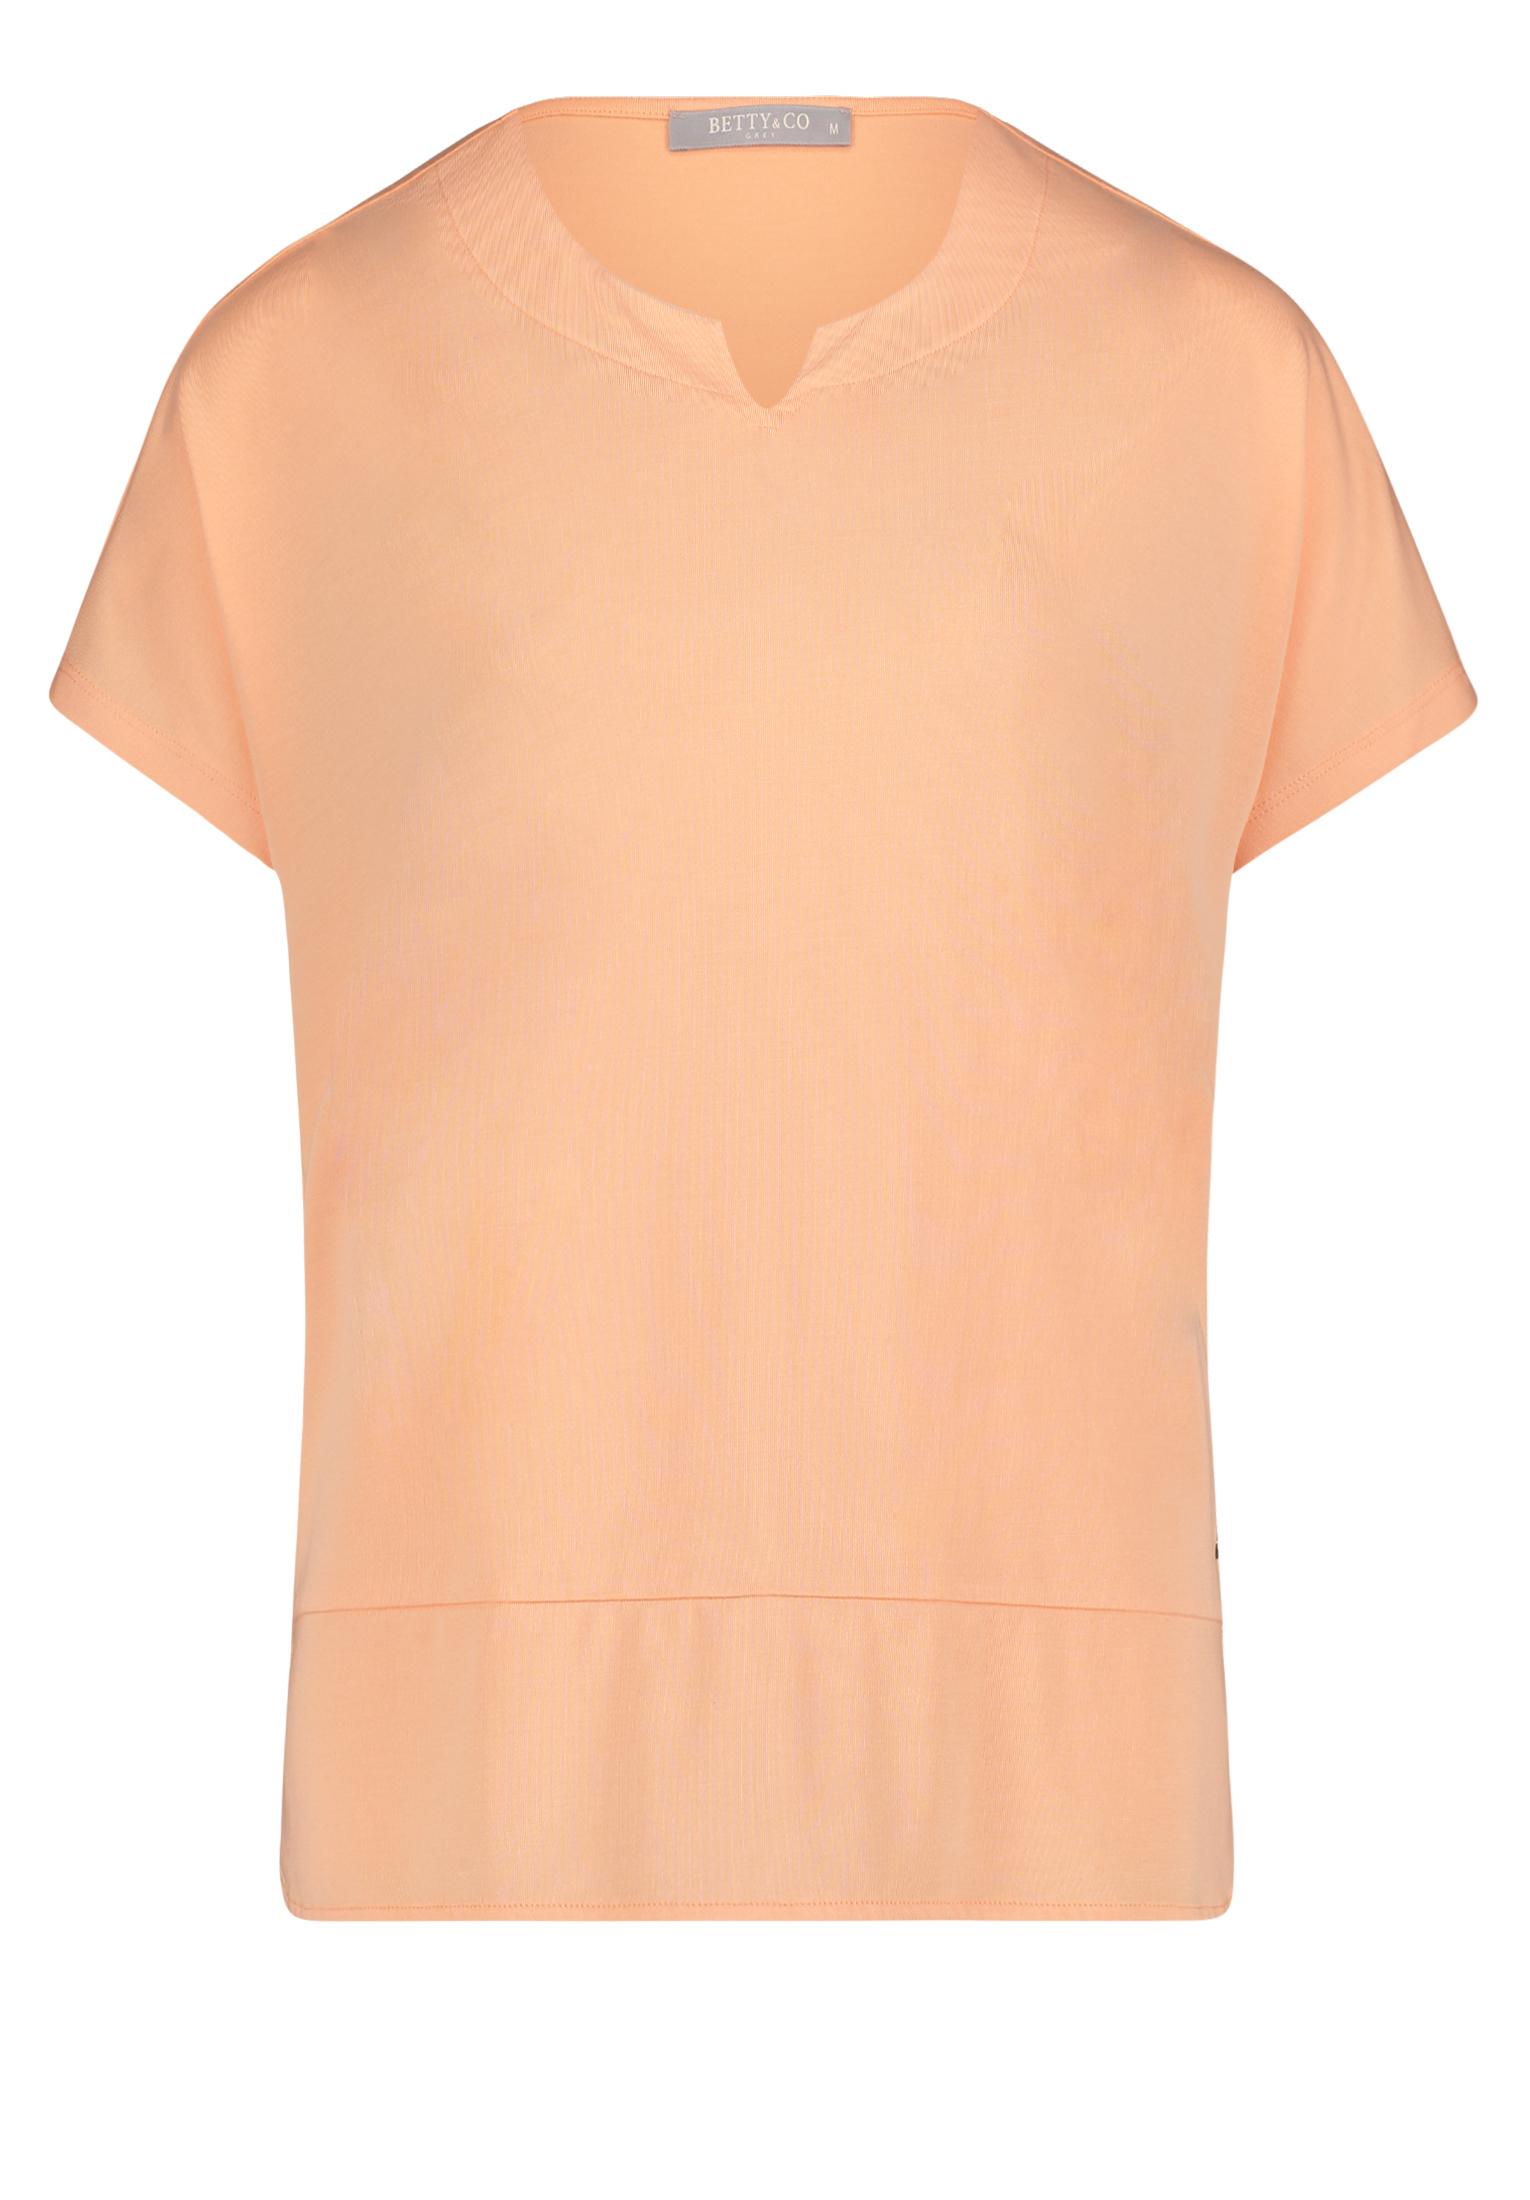 Betty & Co. kurzarm Shirt apricot